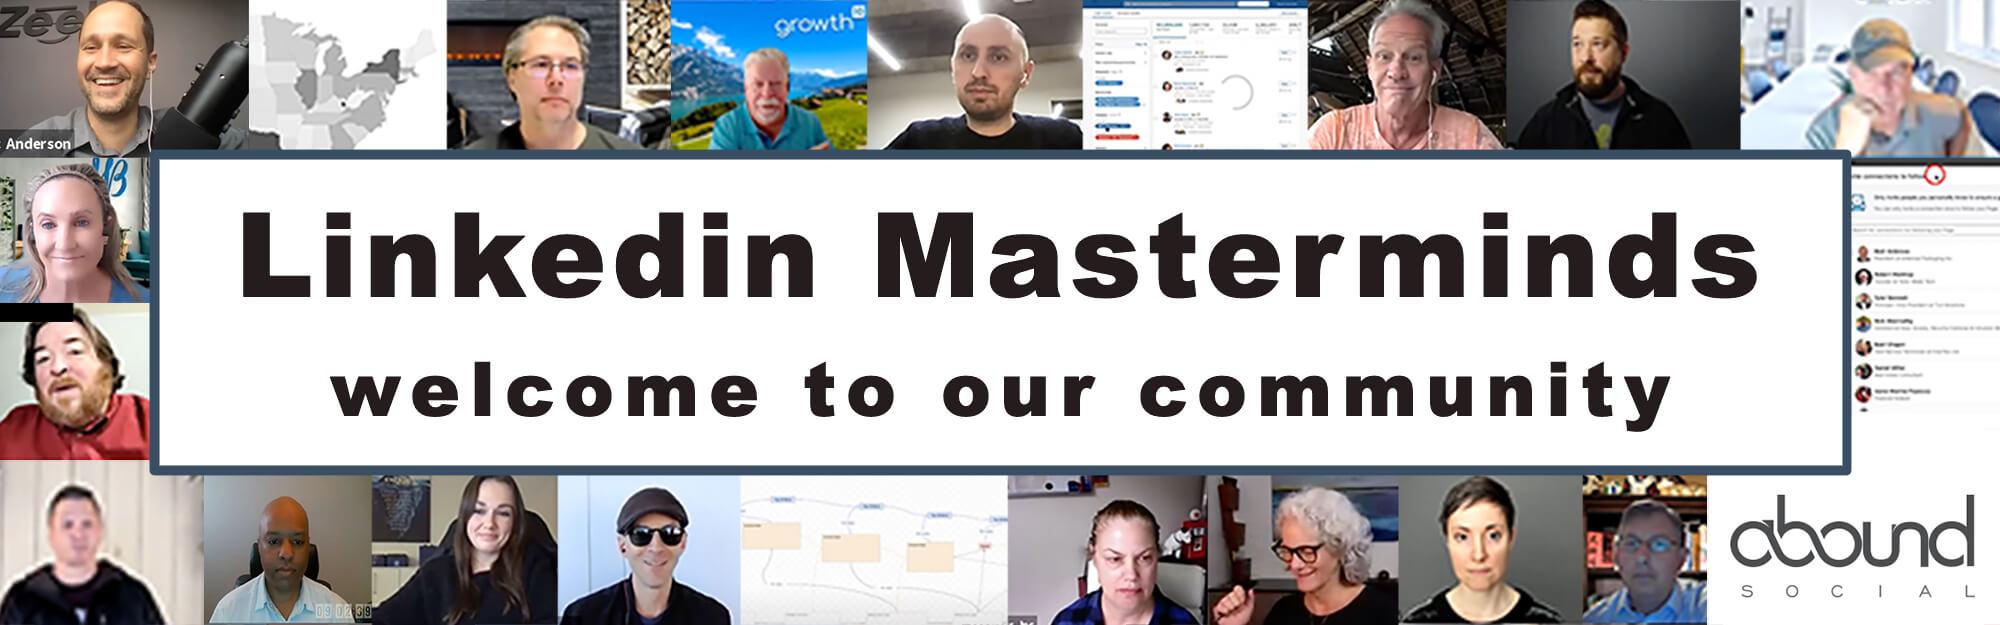 Linkedin Masterminds